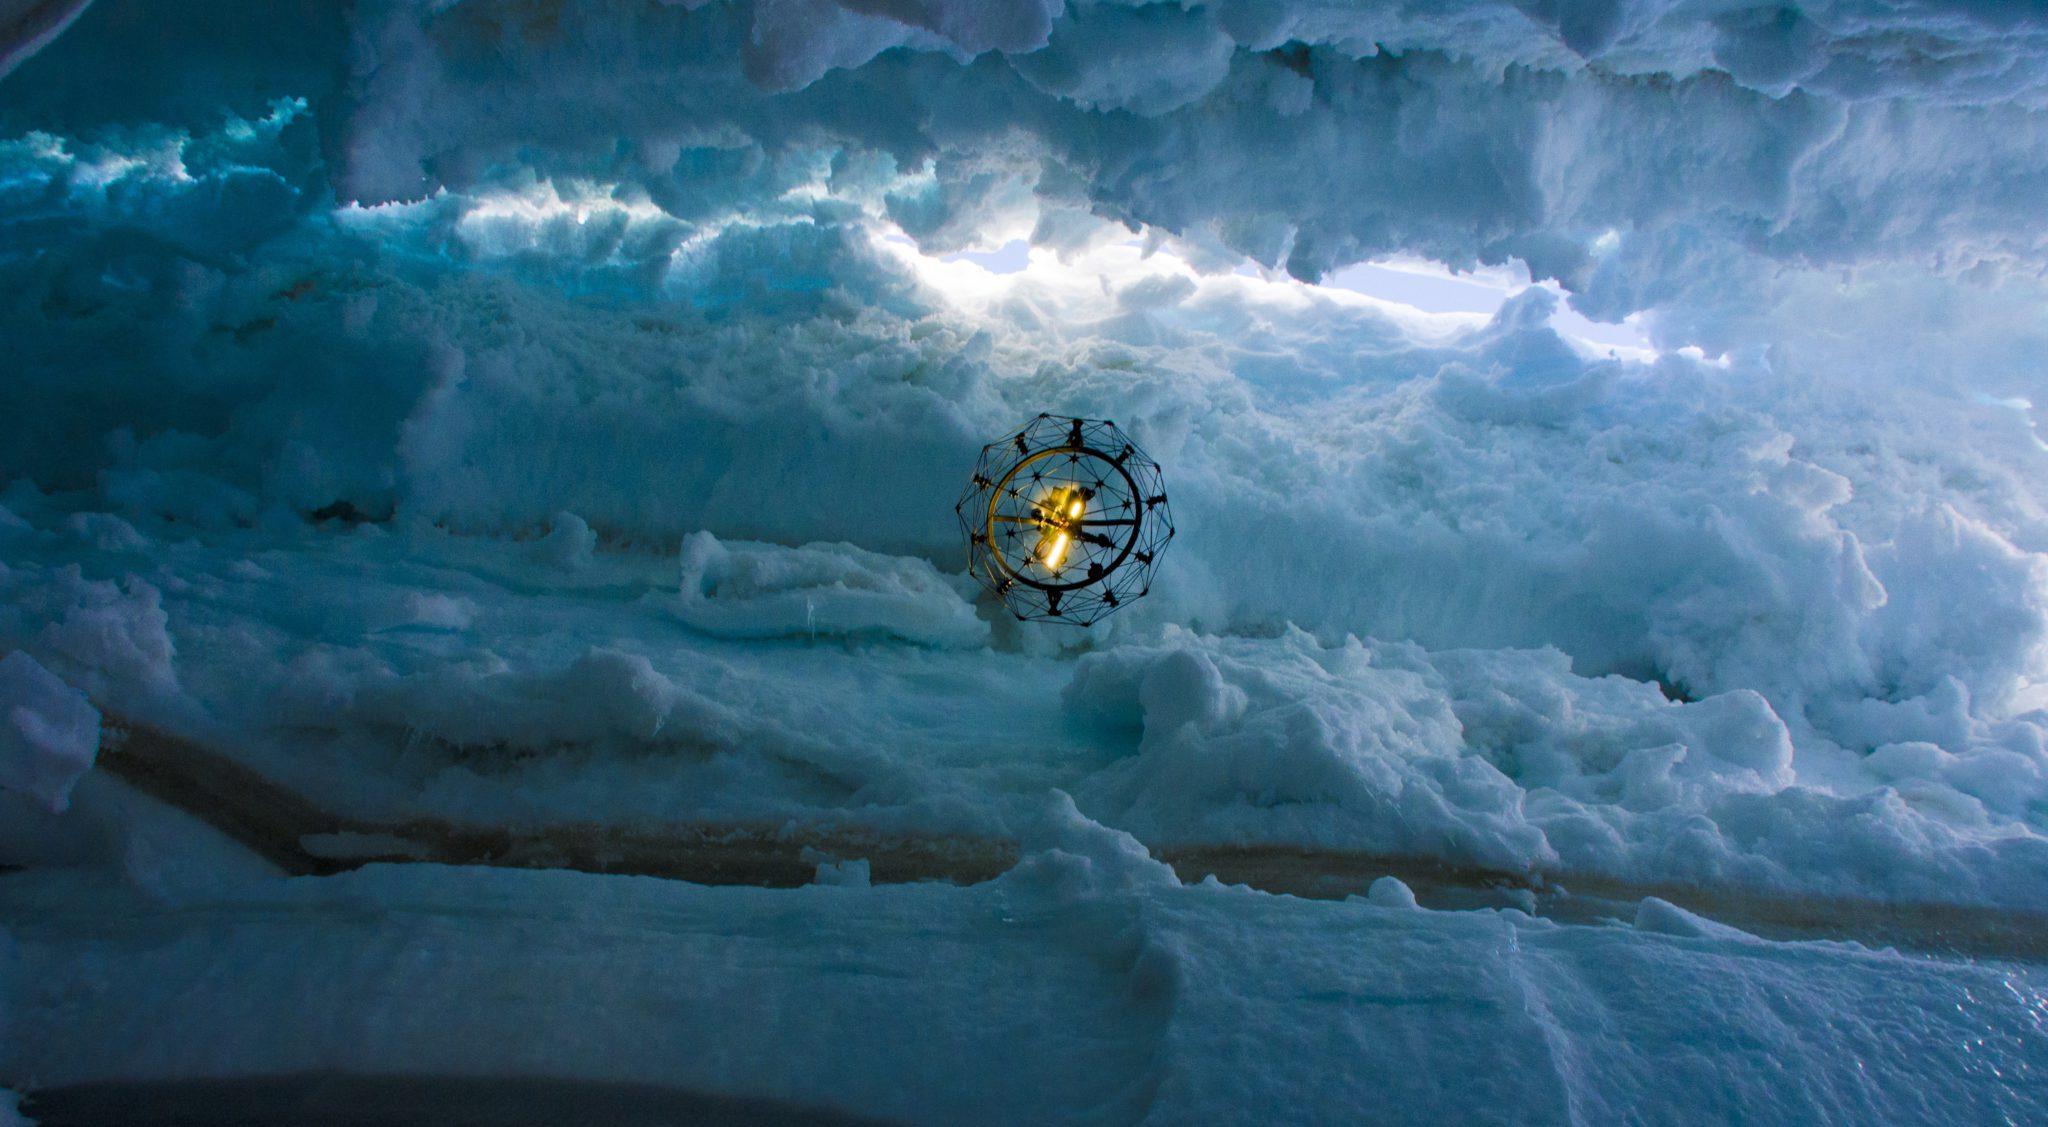 Flyability redefines UAV operation boundaries and explores the heart of a glacier